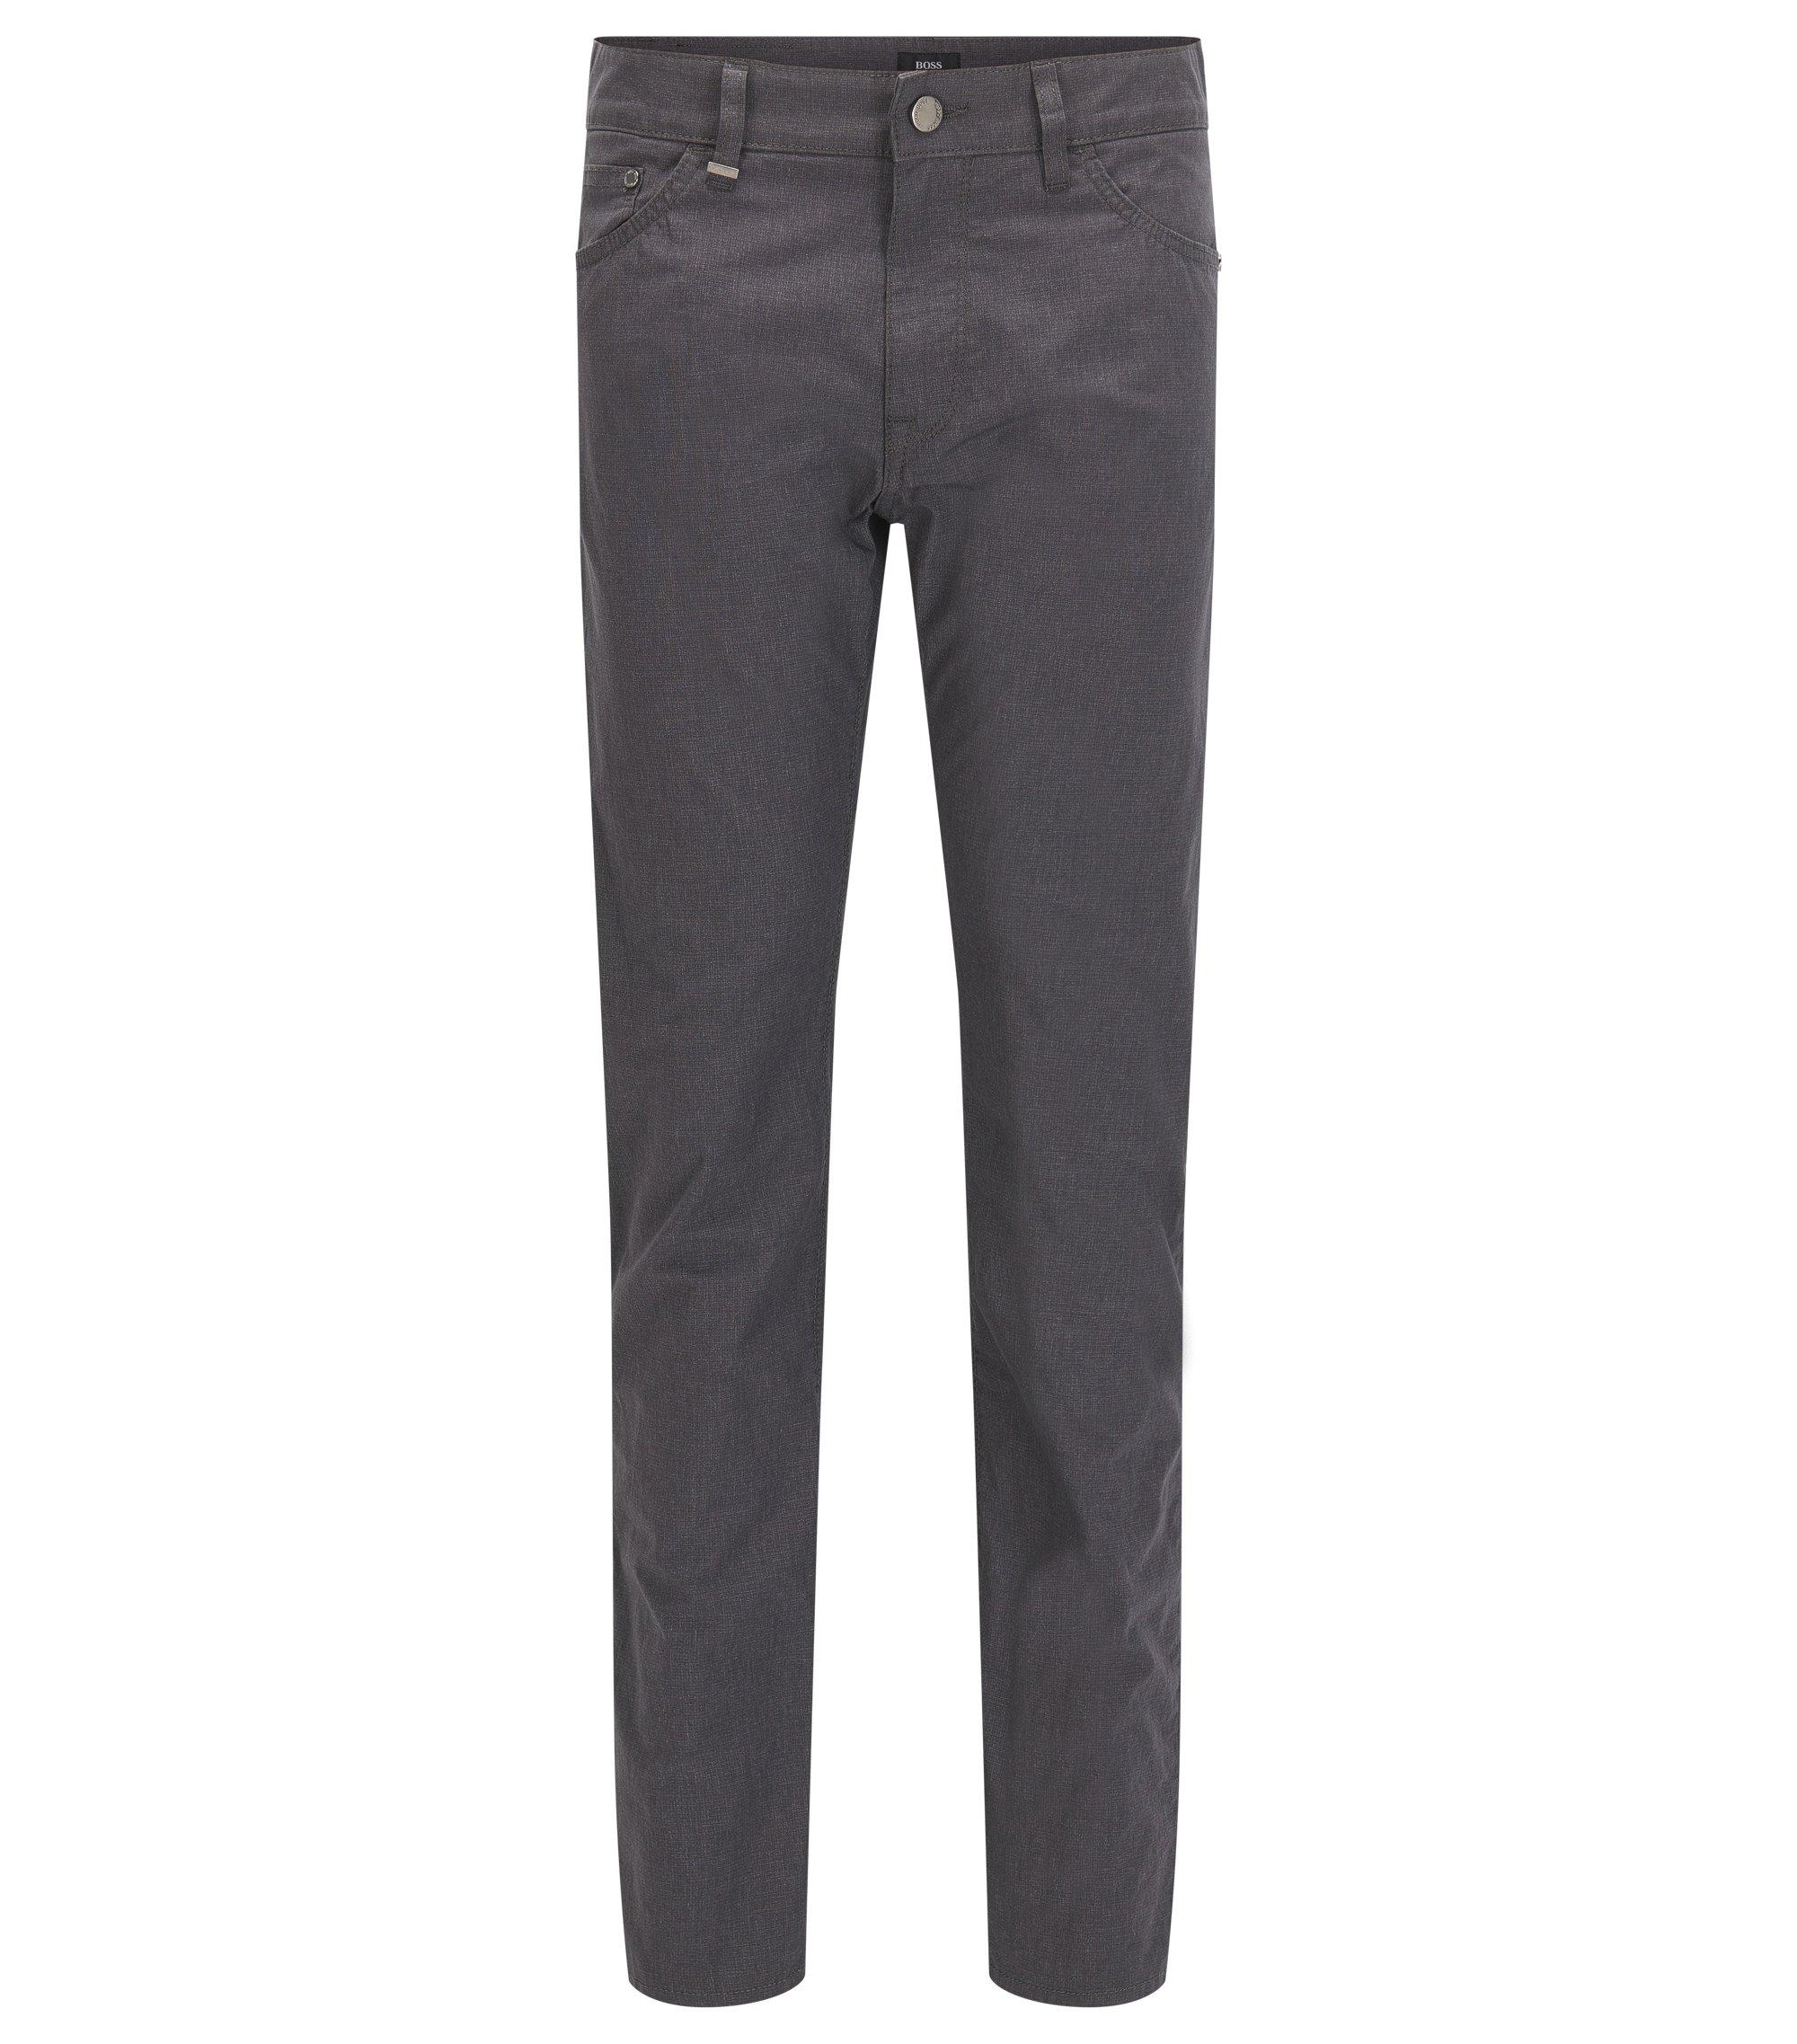 9 oz Basketweave Italian Stretch Cotton Pants, Regular Fit | Maine, Dark Grey